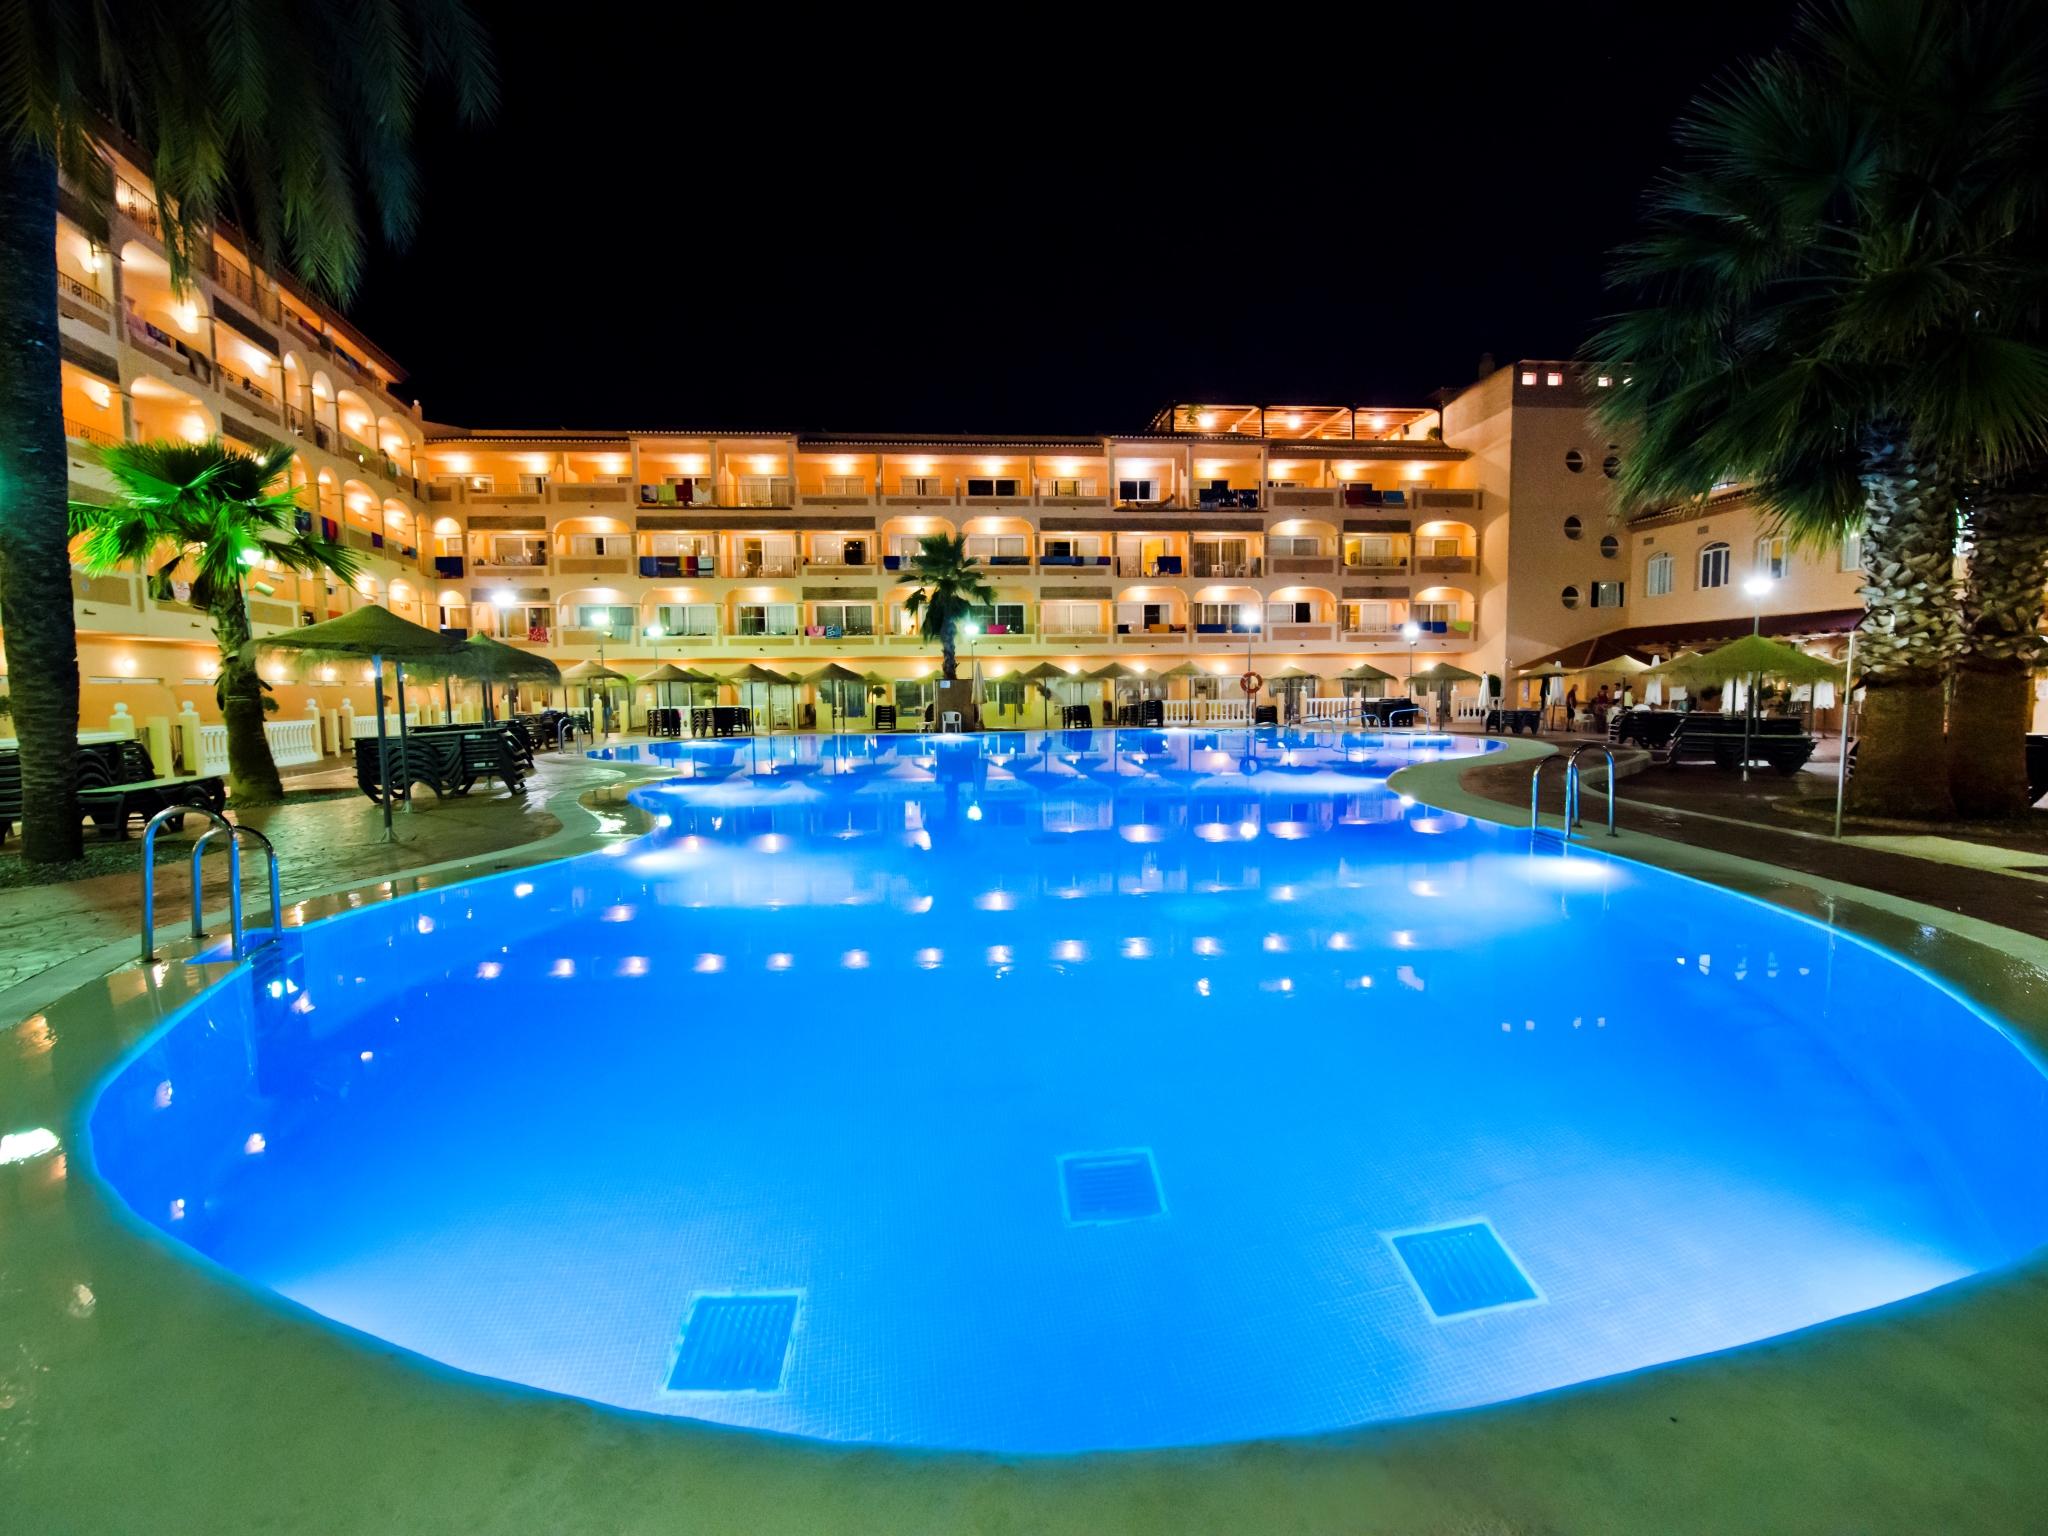 Vista piscina de noche3322jpg